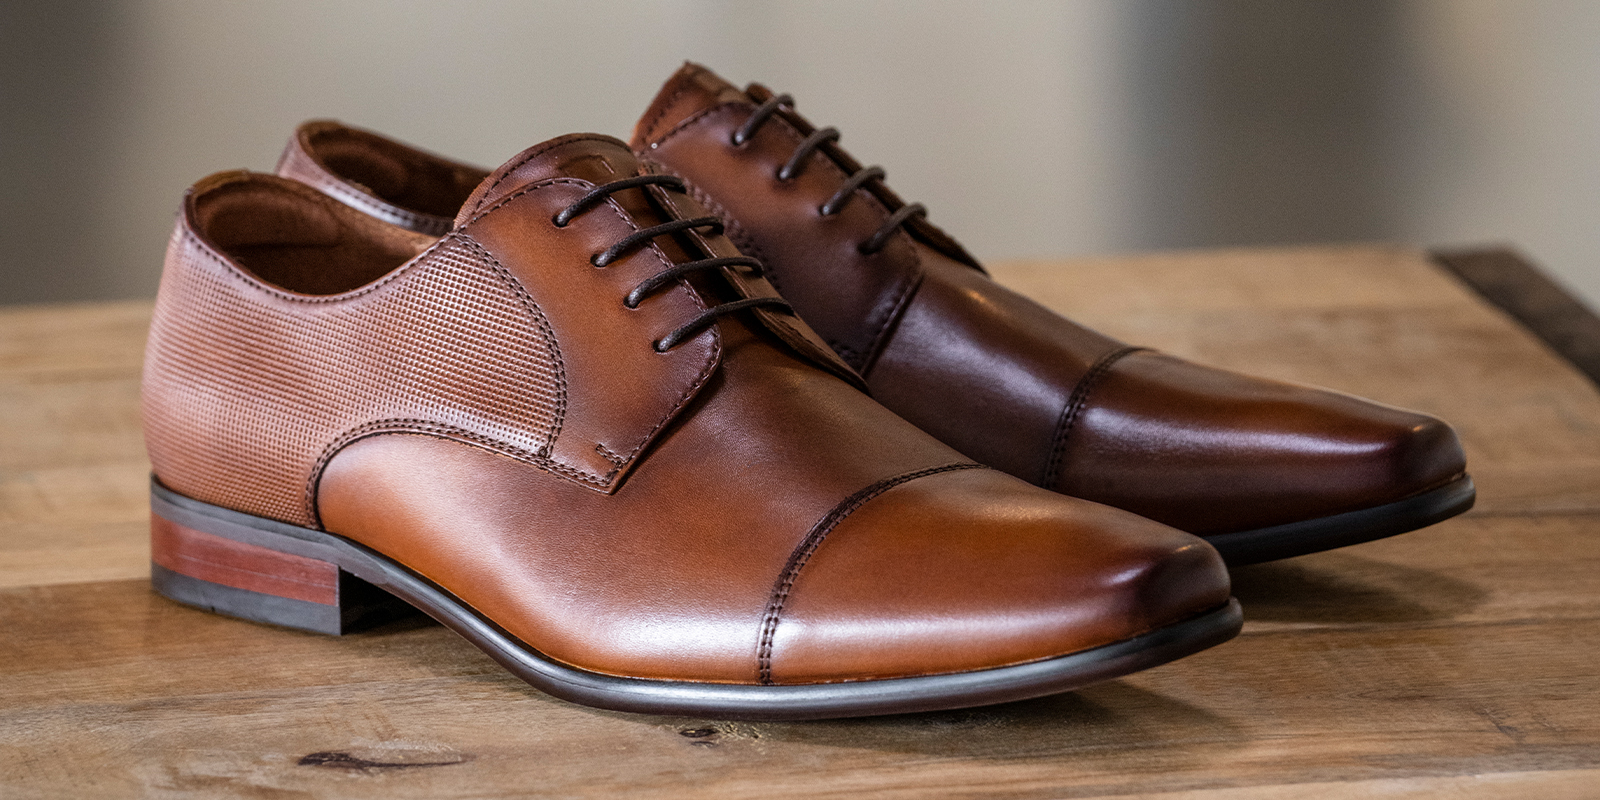 Shoe Fashion Trends